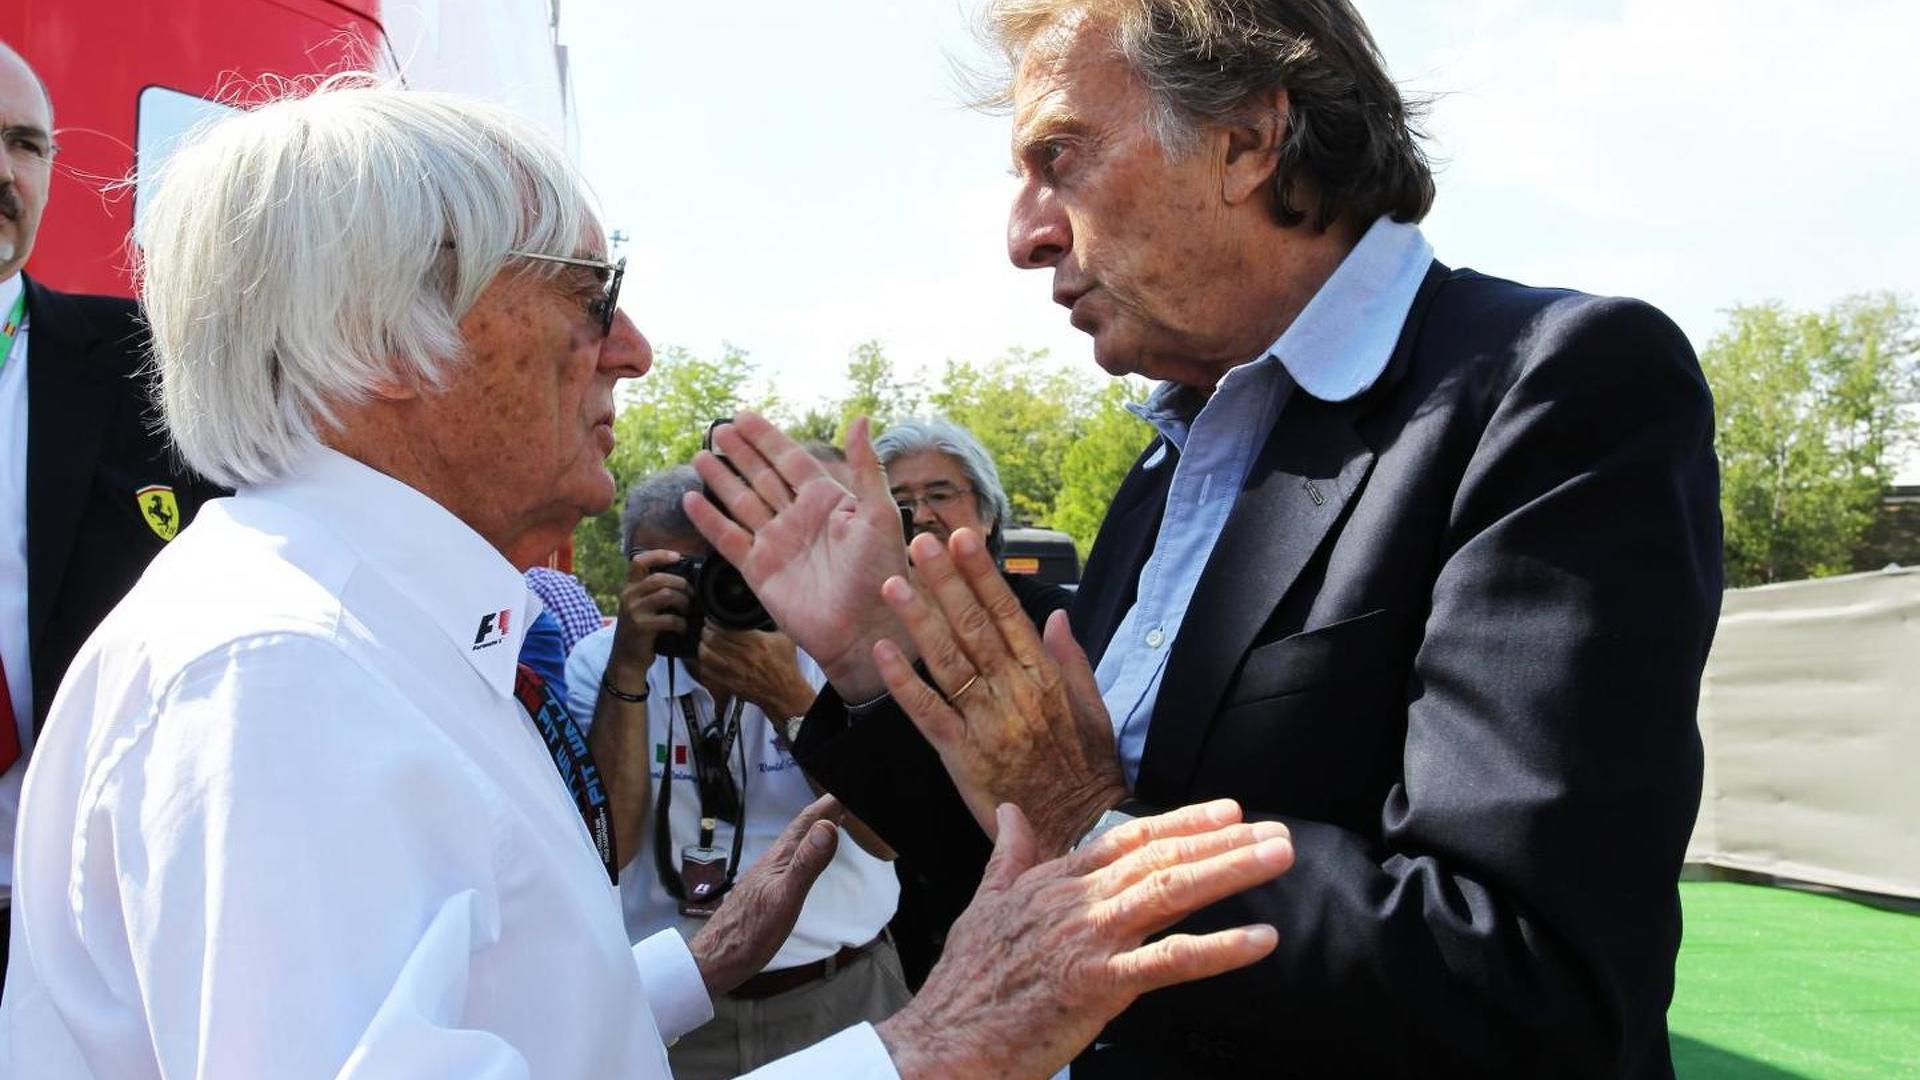 Montezemolo denies calling for Ecclestone axe